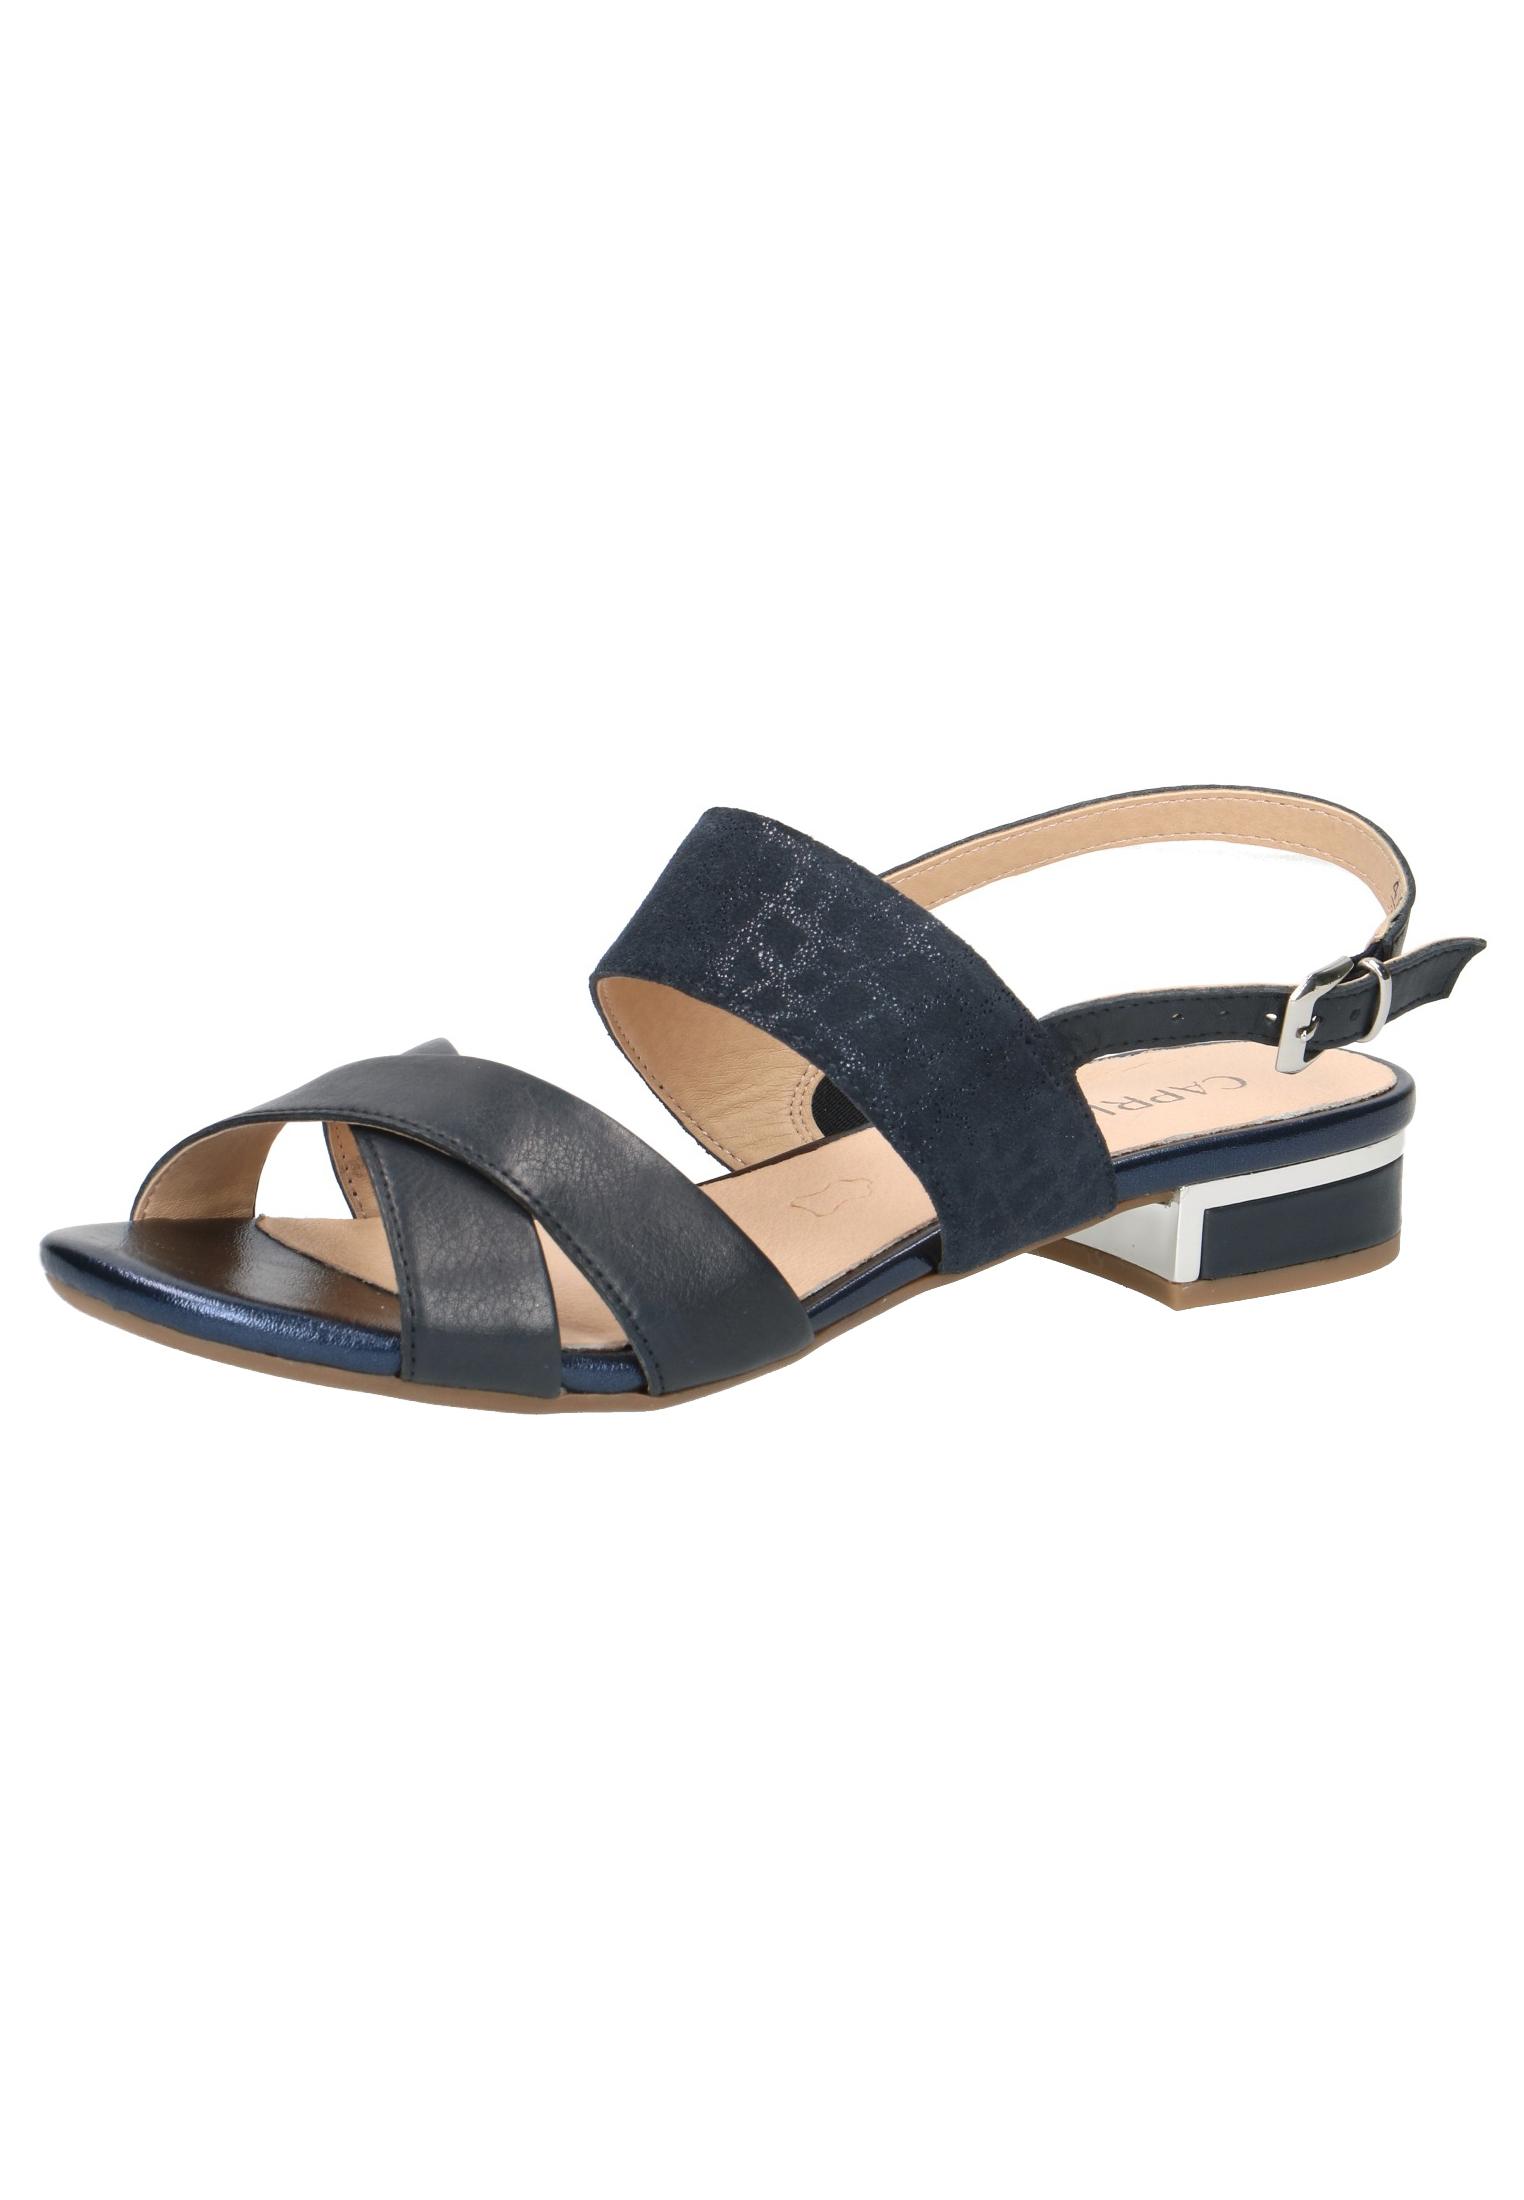 latest design thoughts on check out Caprice Damen Sandale Sandalette Blau 9-28143-22 880 Ocean Comb.